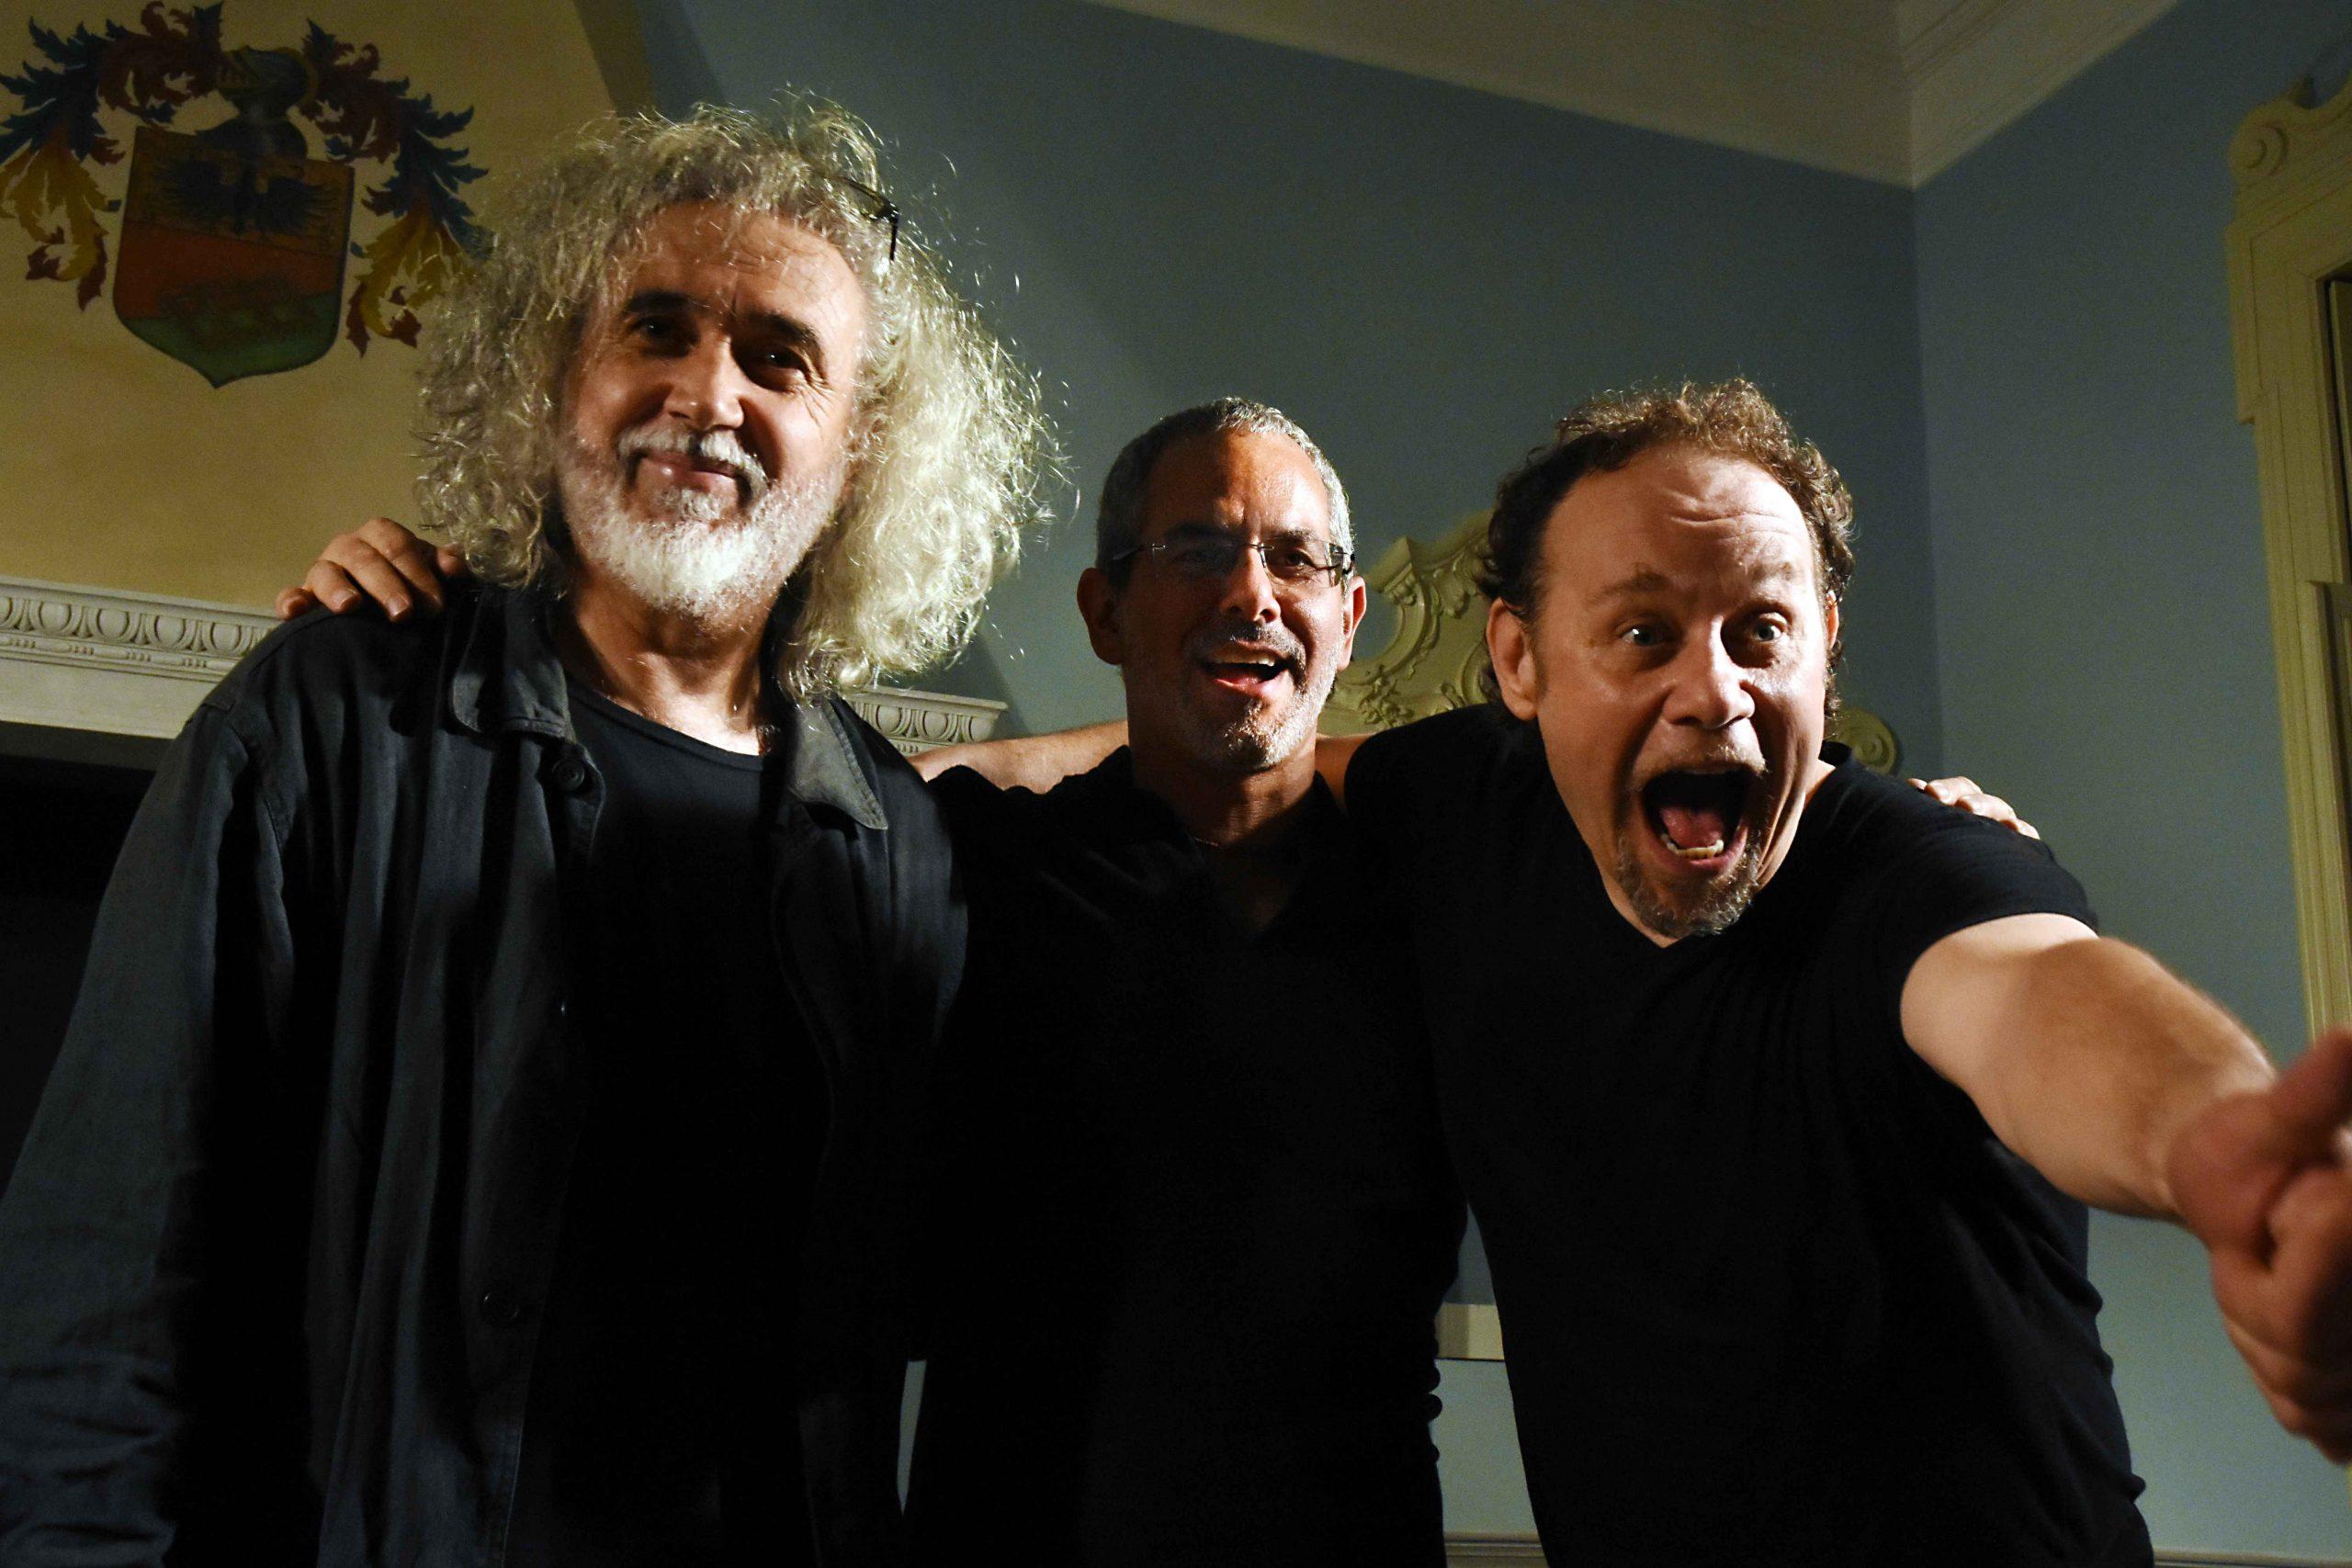 La música de Argentina, Brasil e Italia se entremezclan con ritmos de jazz en 'Tres Mundos'